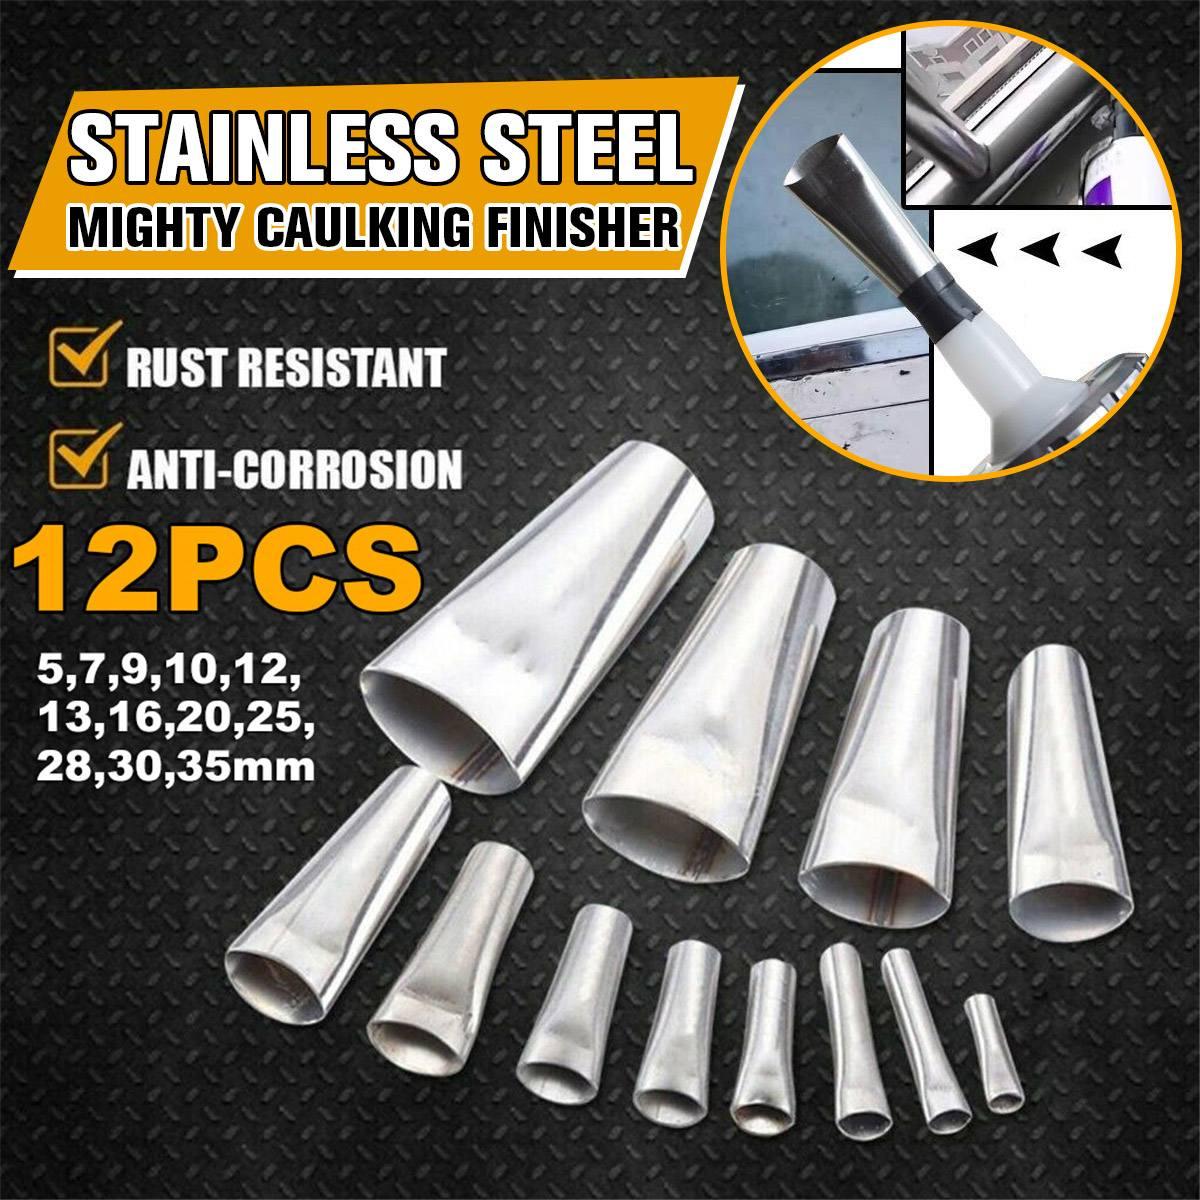 Caulking Finisher Silicone Sealant Nozzle Glue Remover Scraper Caulking Nozzle Waterproof Glass Wall Repair AP5